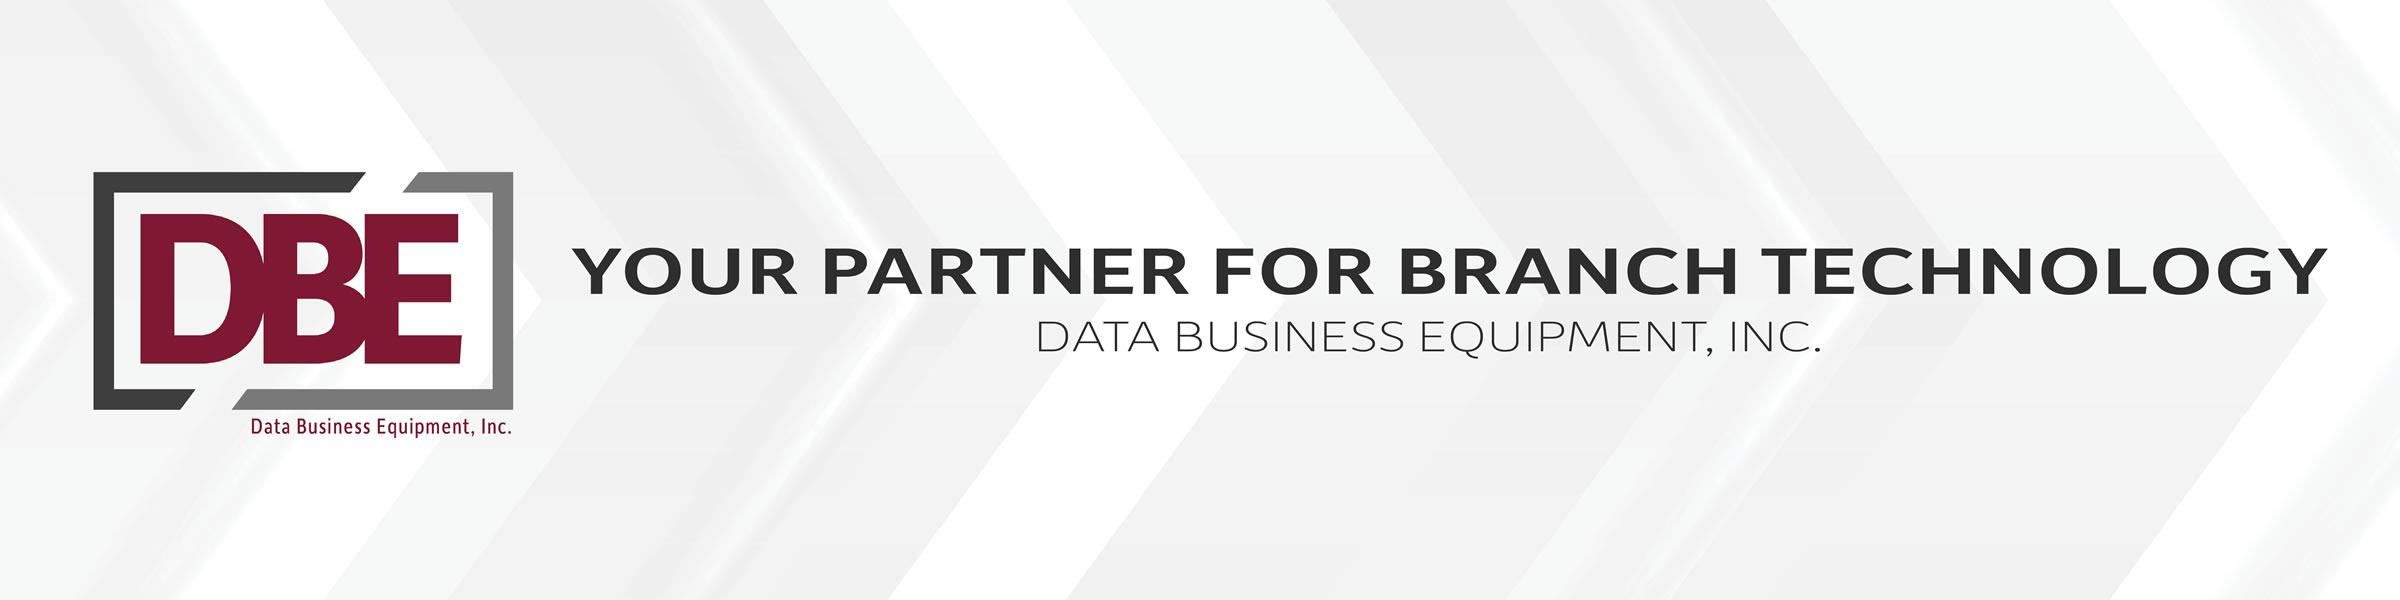 Data Business Equipment